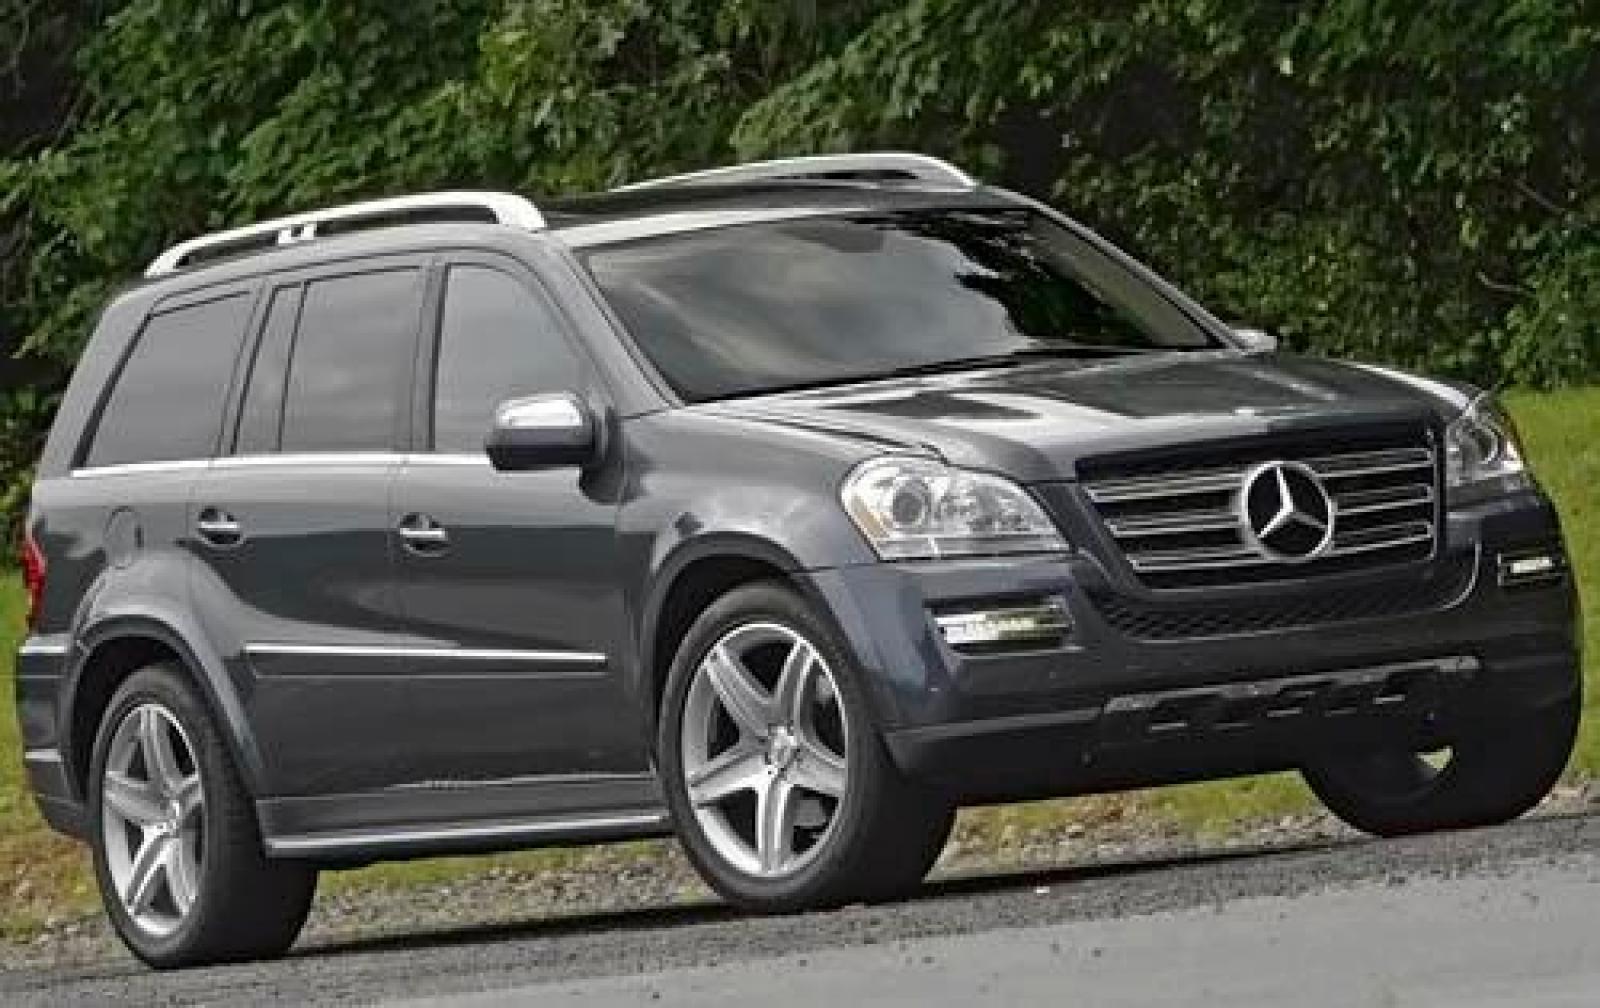 800 1024 1280 1600 Origin 2010 Mercedes Benz Gl Cl